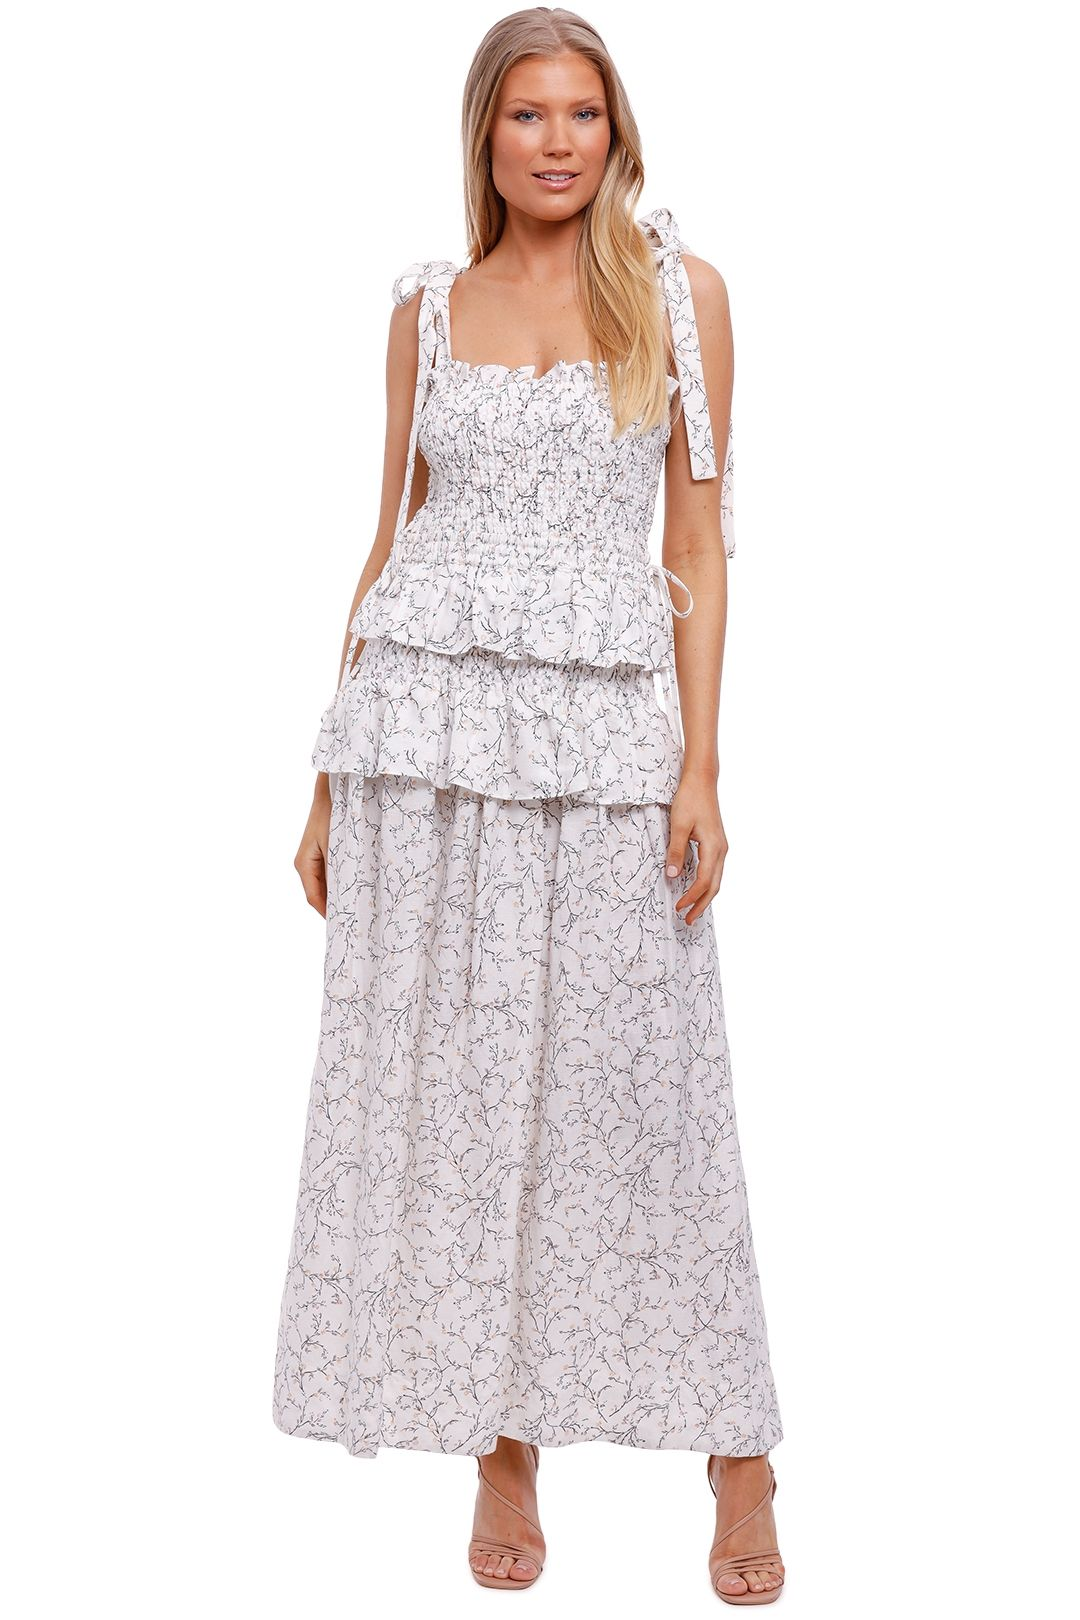 Shona Joy Shirred Maxi Dress